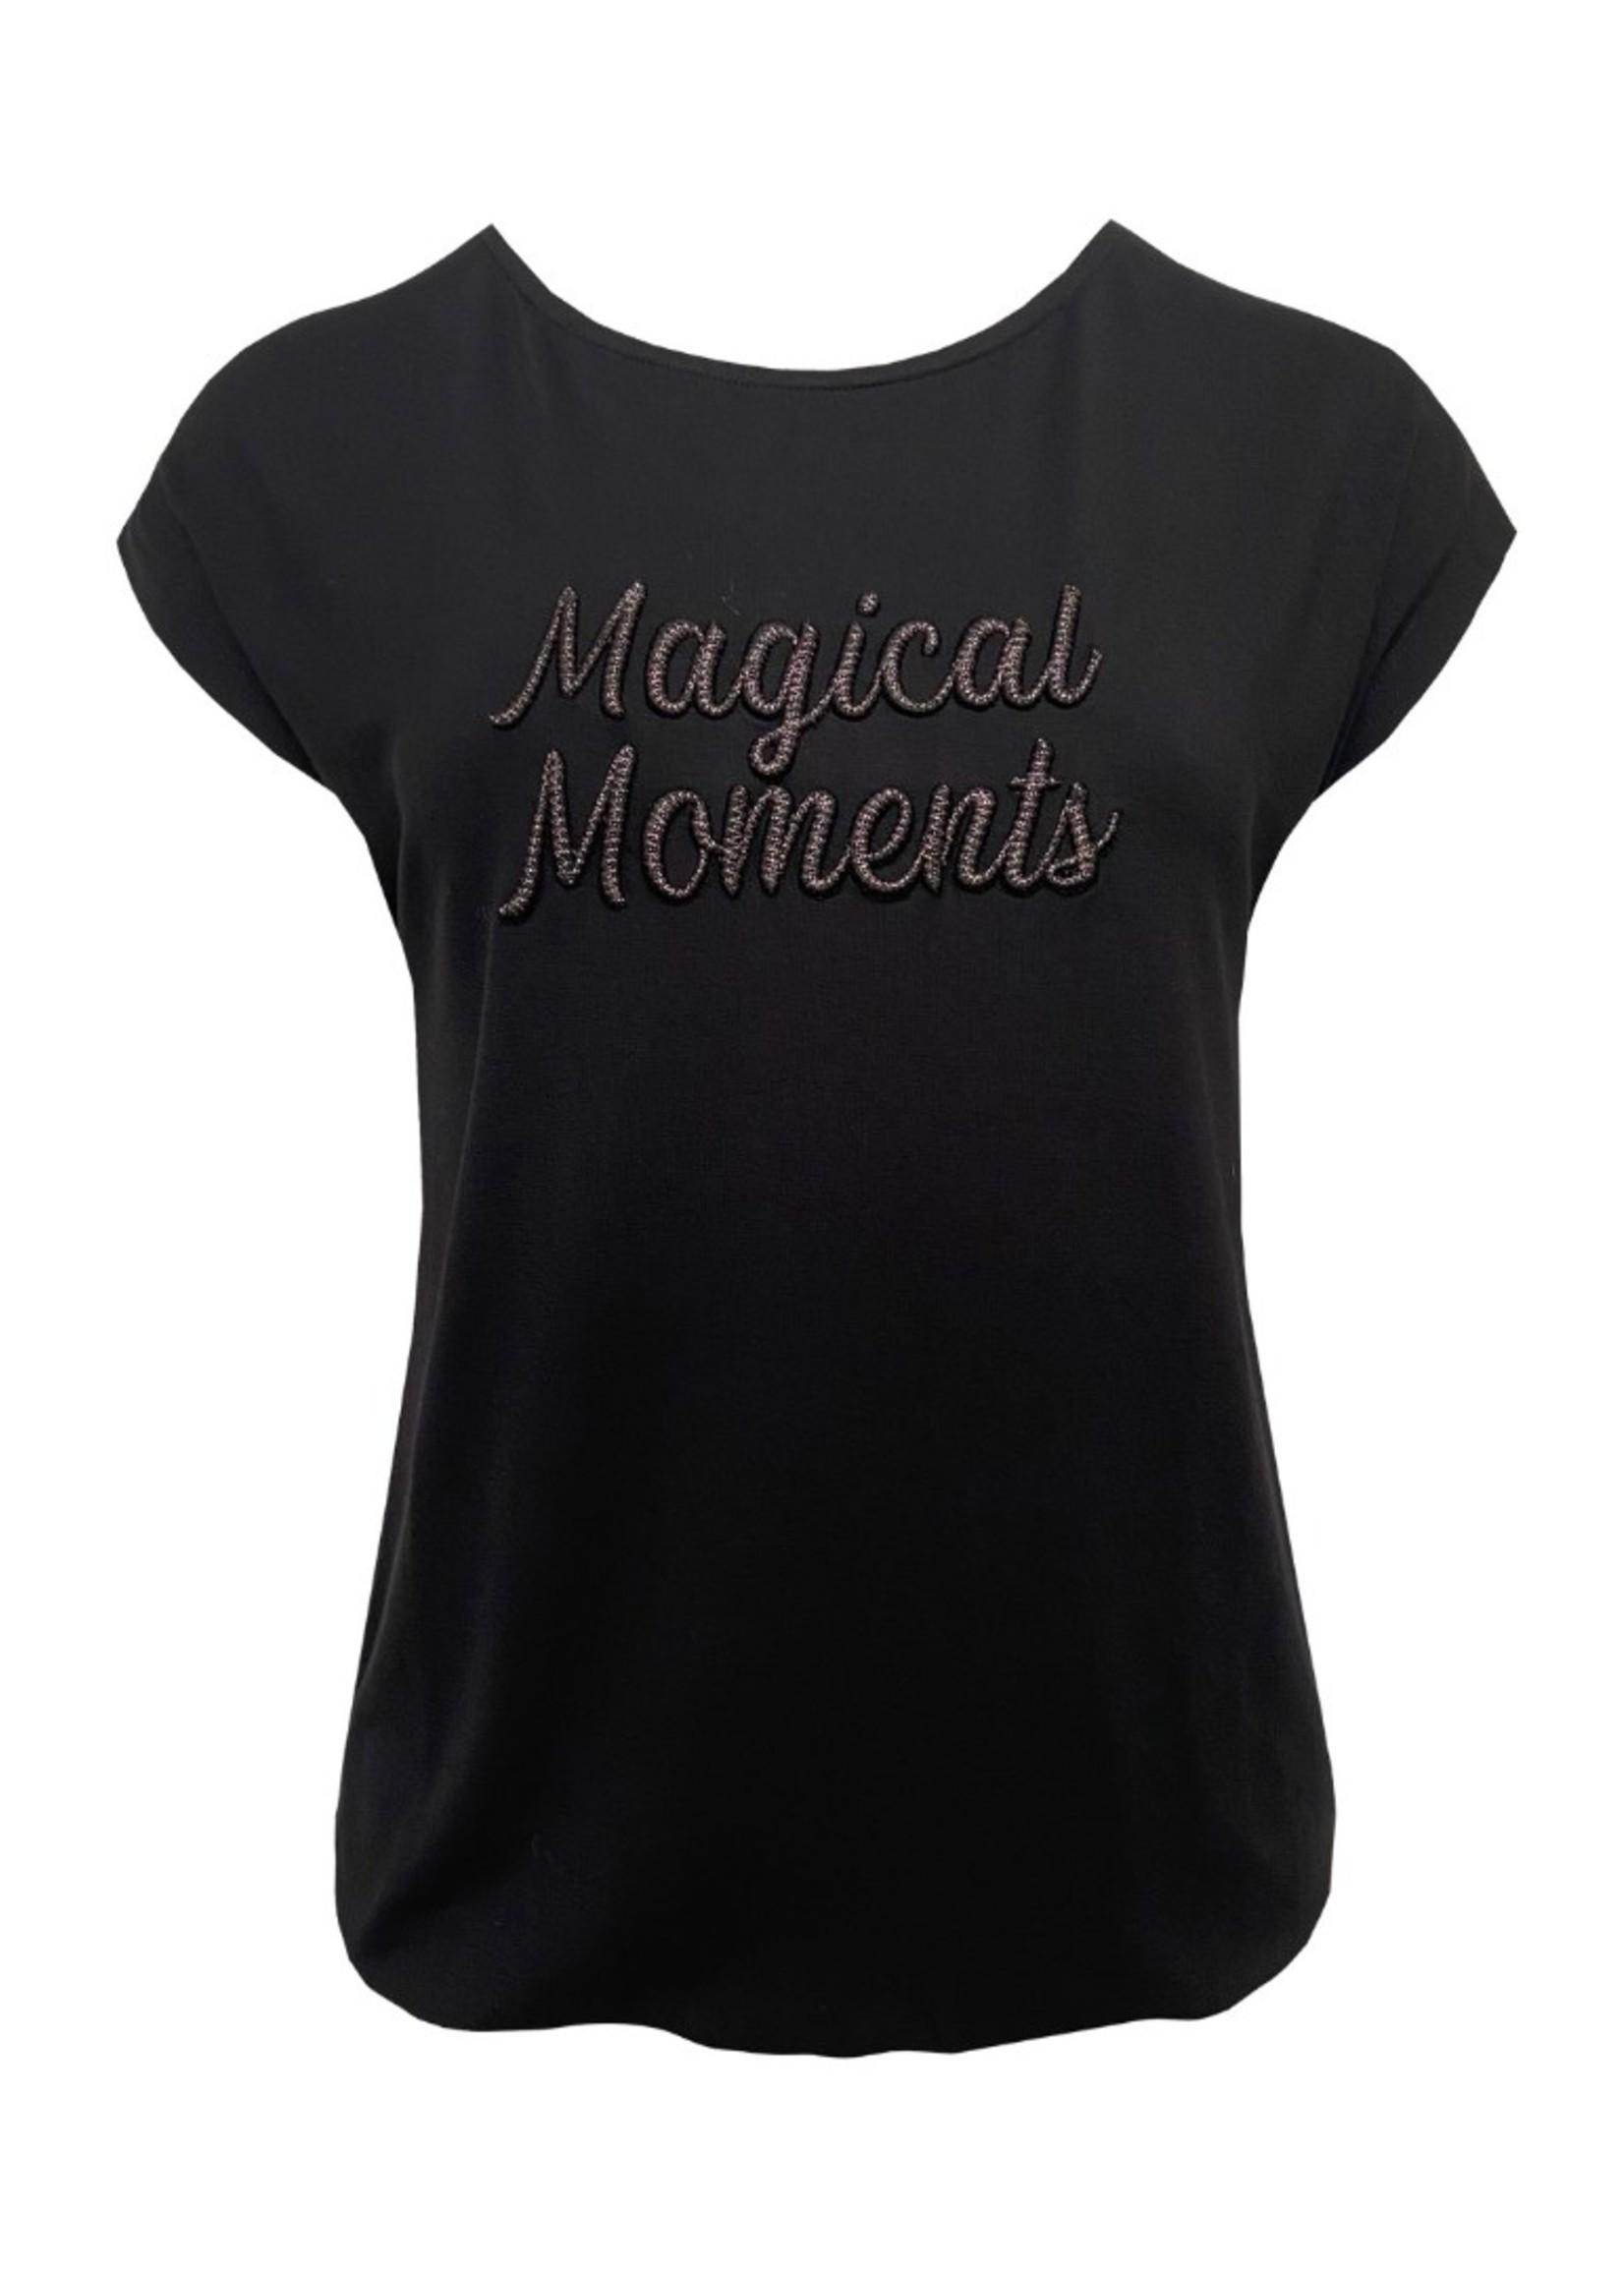 Elvira Collections Elvira Collections Moments T-shirt